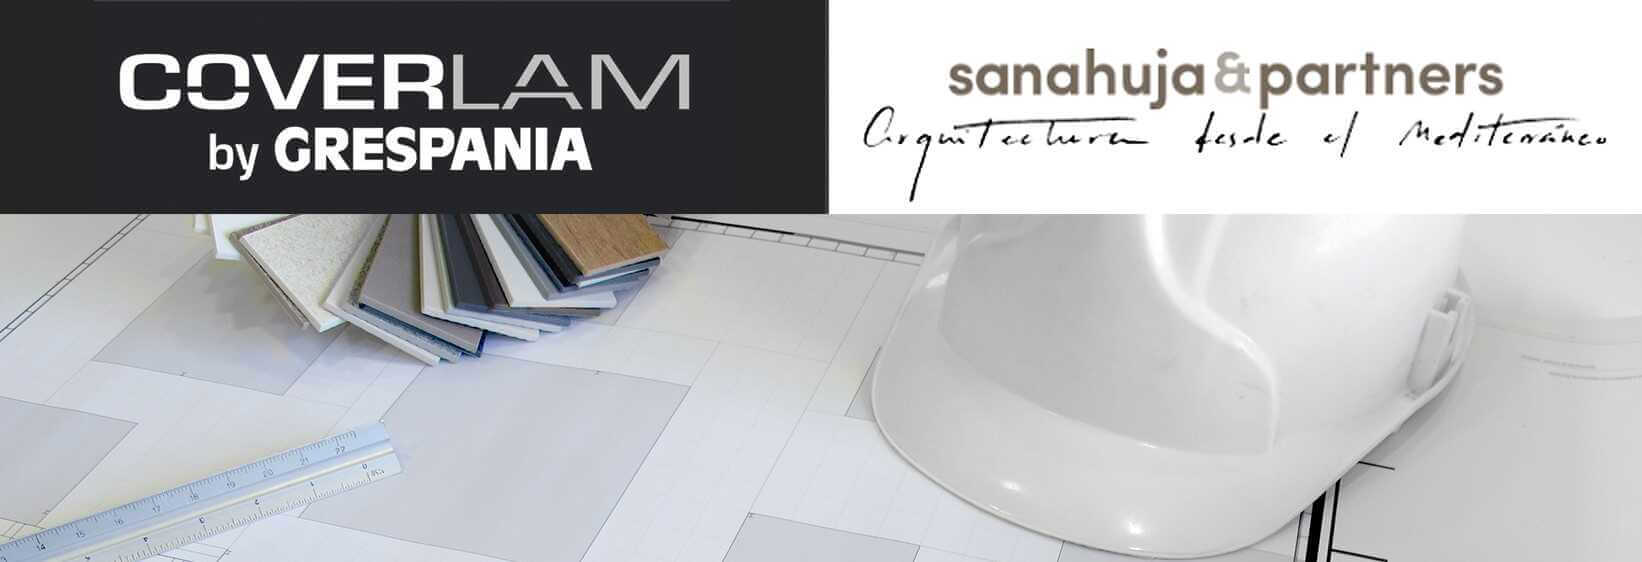 Expo Coverlam Banner | Grespania, Ultimando Su Nuevo Showroom Exclusivo Para Coverlam.